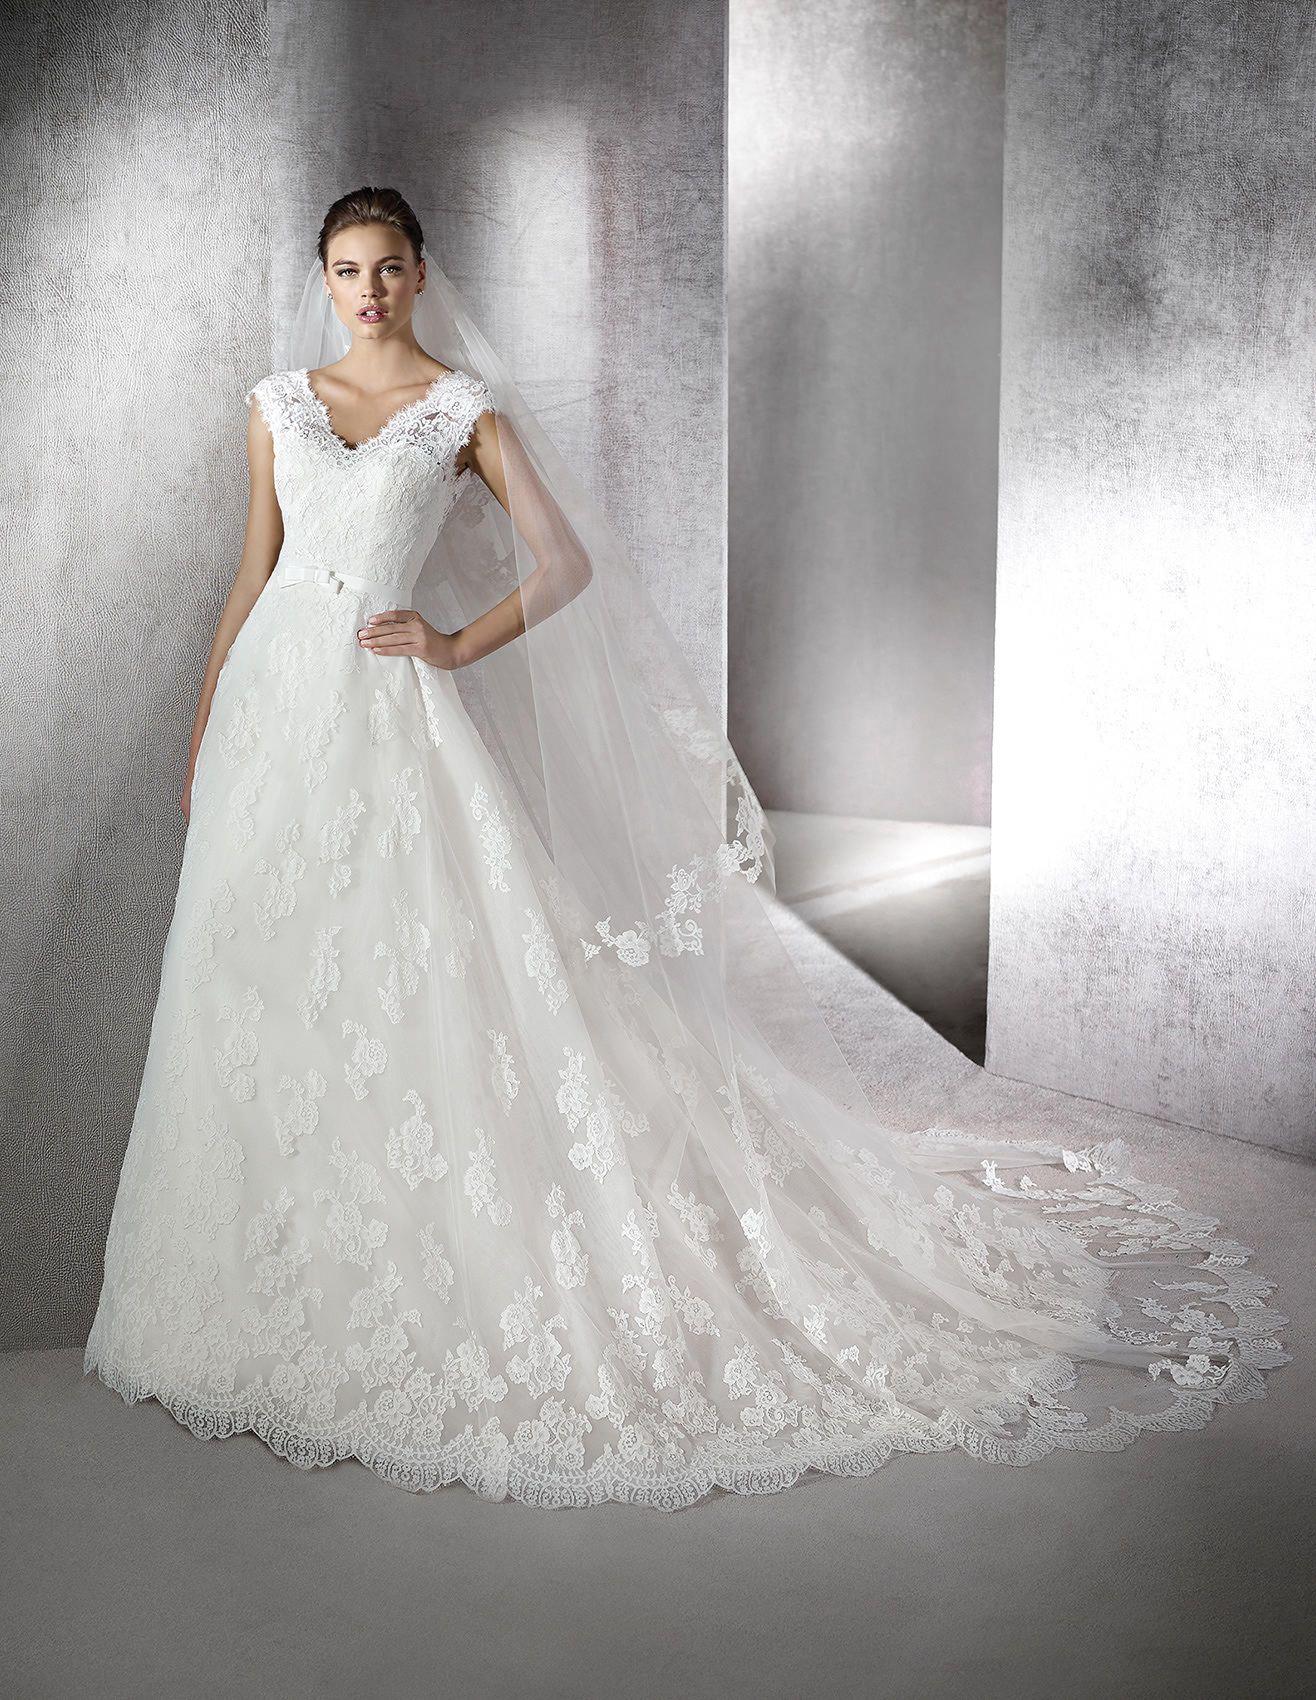 8c33680e3 ZELMIRA - Vestido de novia de estilo princesa